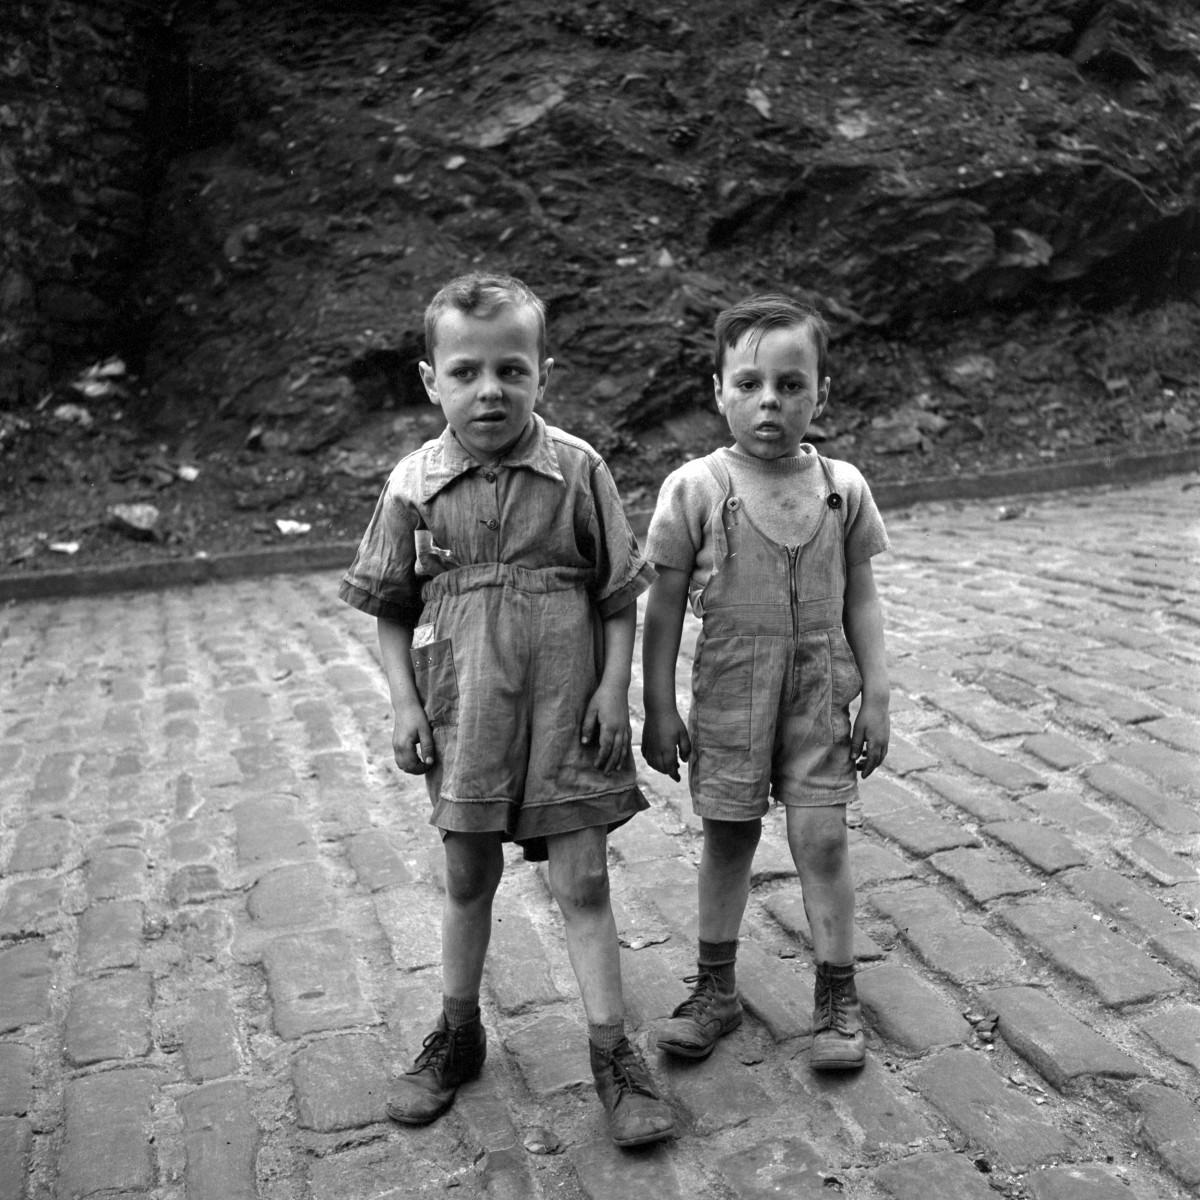 Chicagoland, fecha desconocida, 40x50 cm. © Vivian Maier Maloof Collection, Courtesy Howard Greenberg Gallery, New York